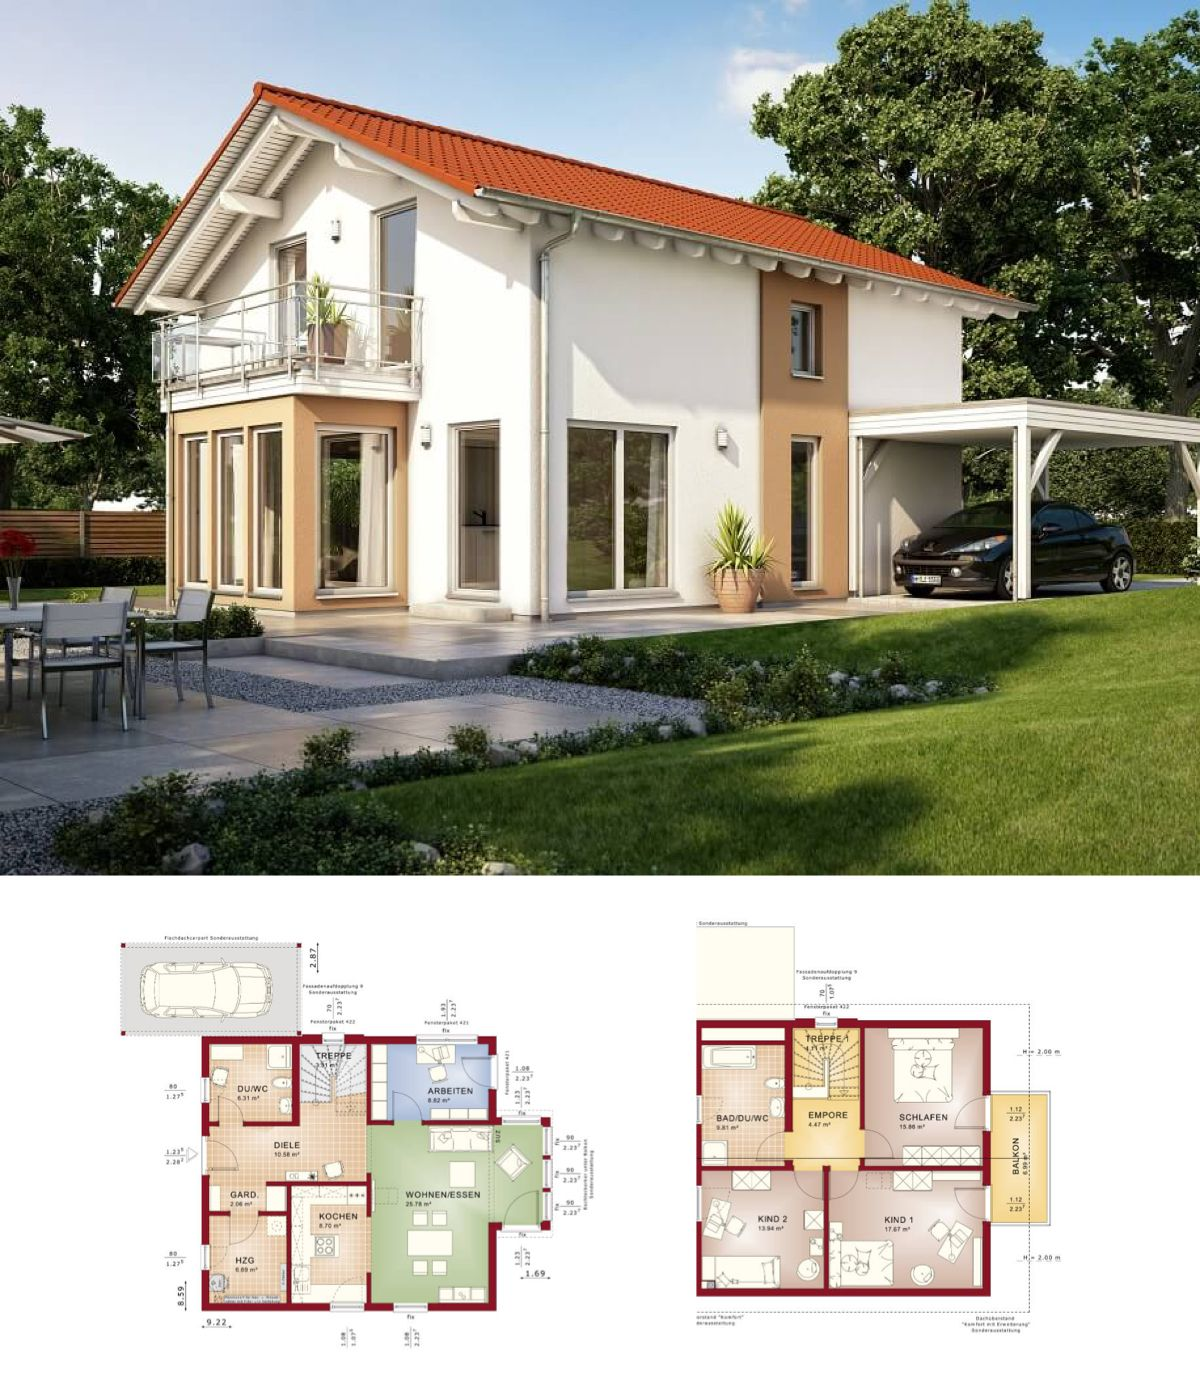 Modernes haus solution 134 v7 living haus for Modernes einfamilienhaus grundriss